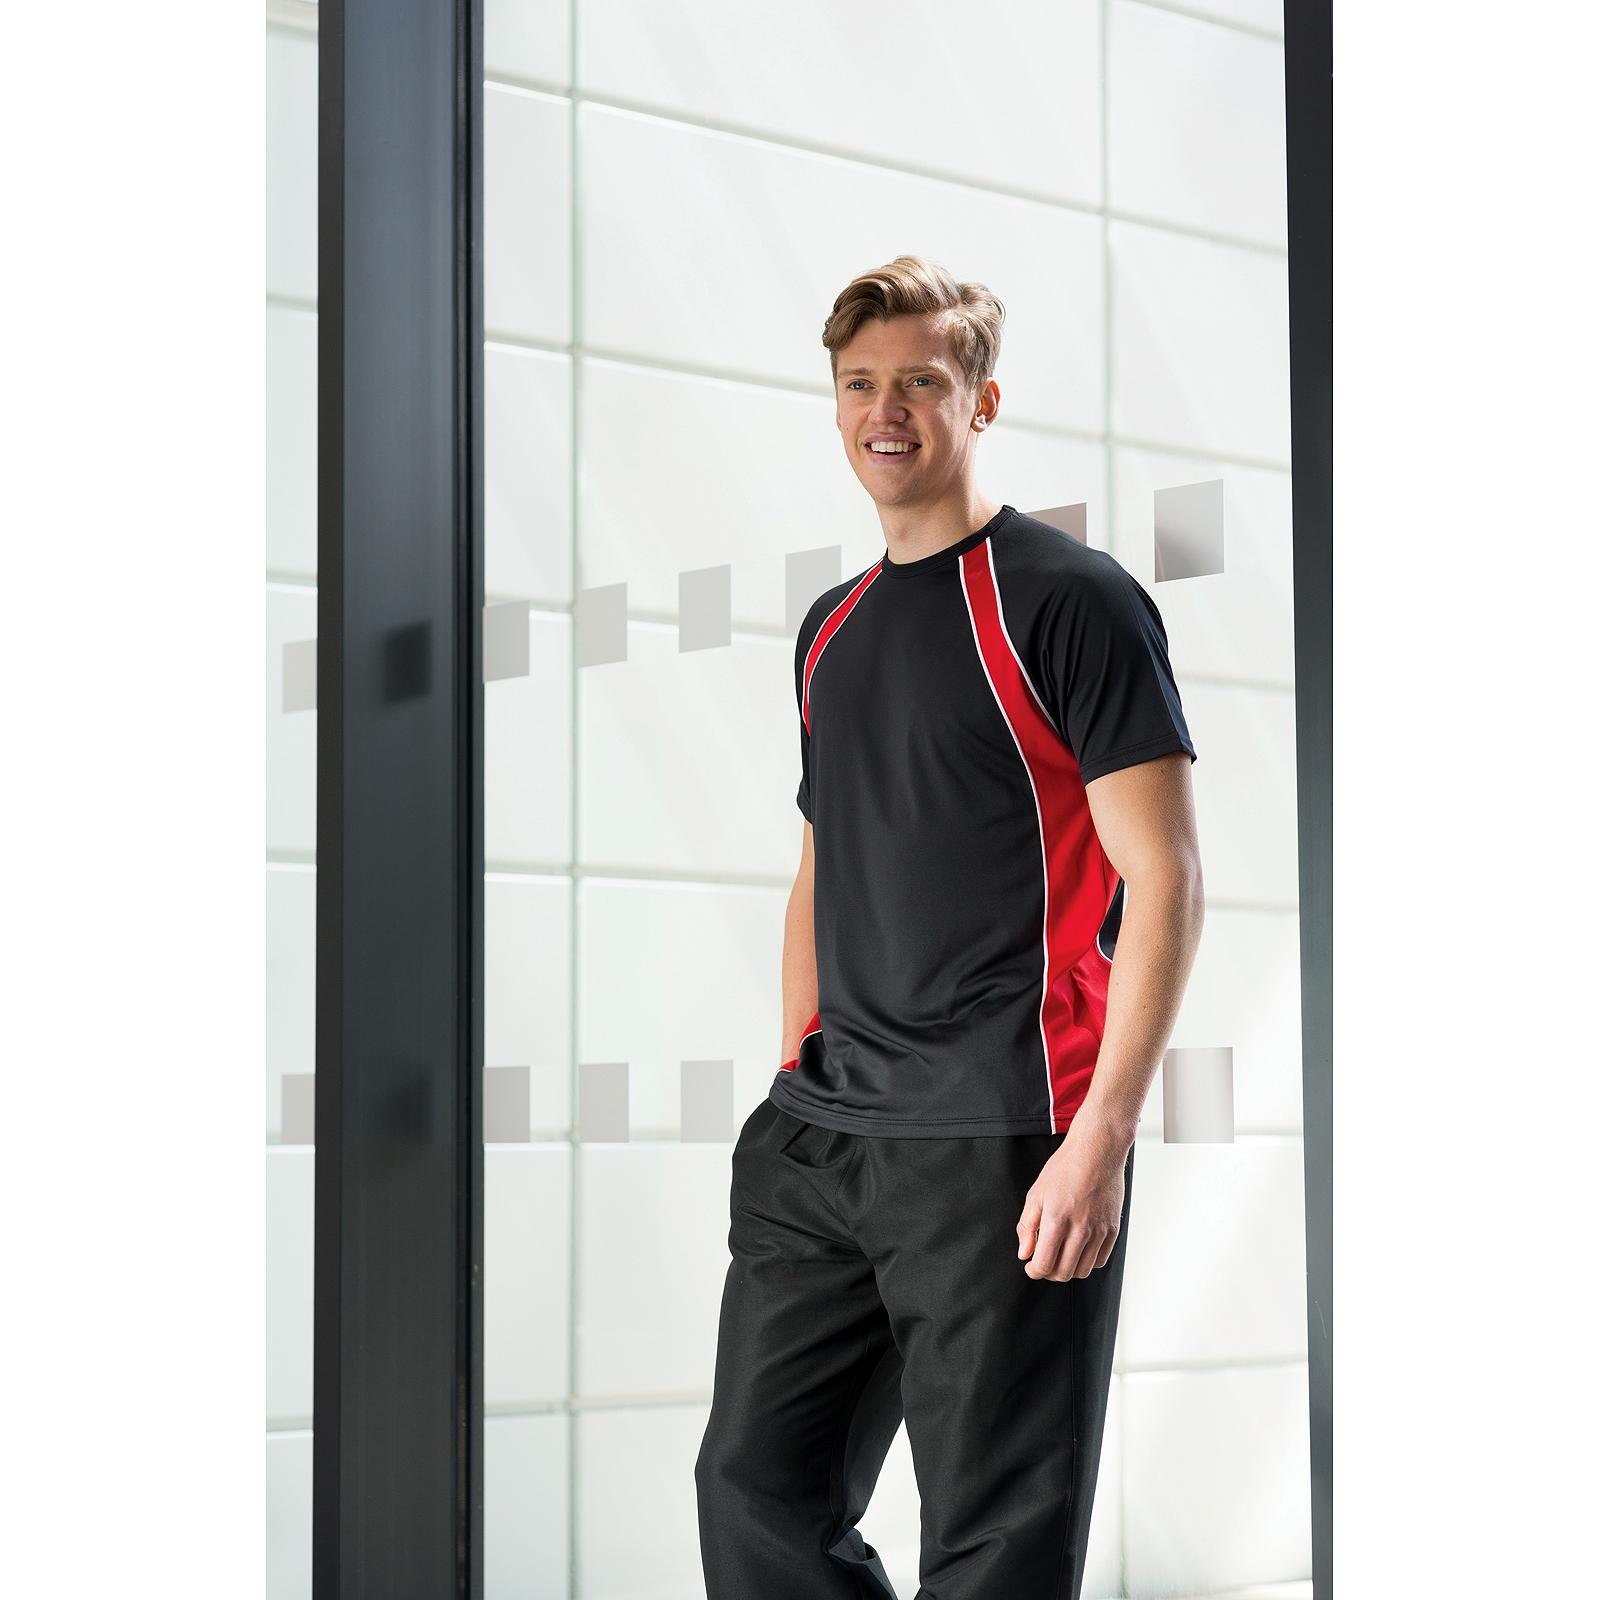 Tombo Sleeveless T-Shirt Mens Gym Active Wear Slim Shaped Fit Tee Tshirts Tops